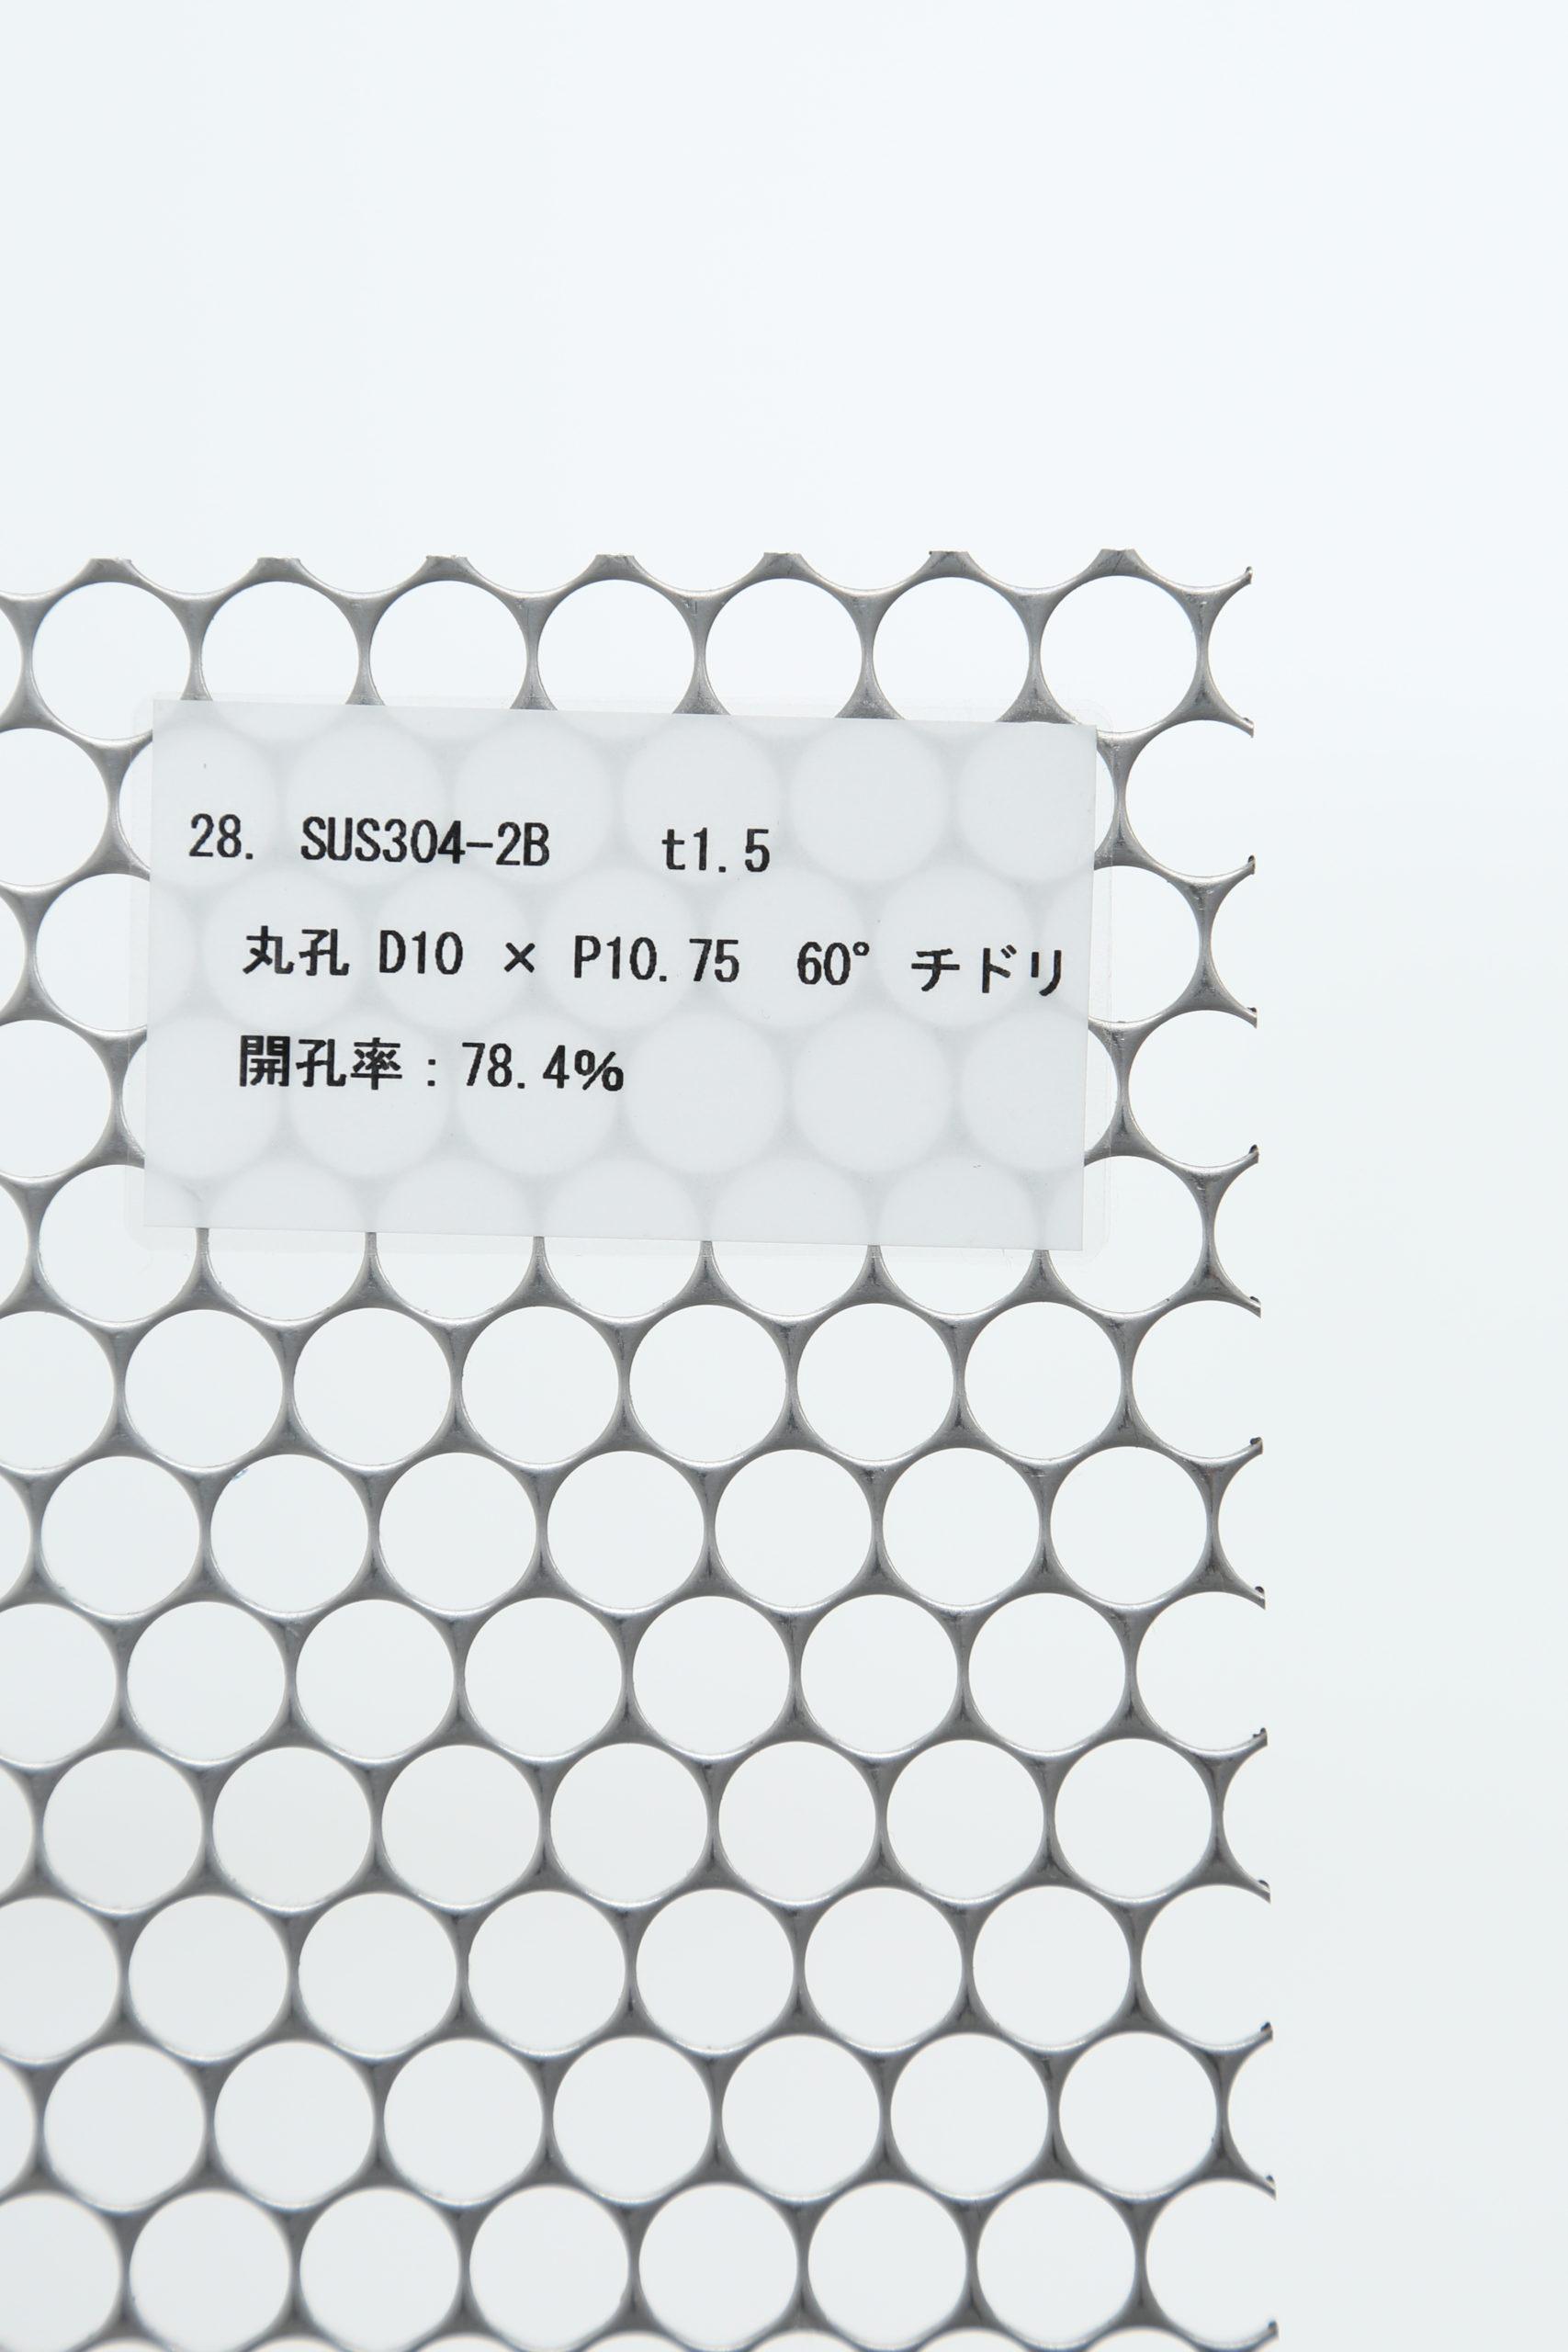 SUS 304-2B t1.5 丸孔 D10×P10.75 60°チドリ 開口率:78.4%